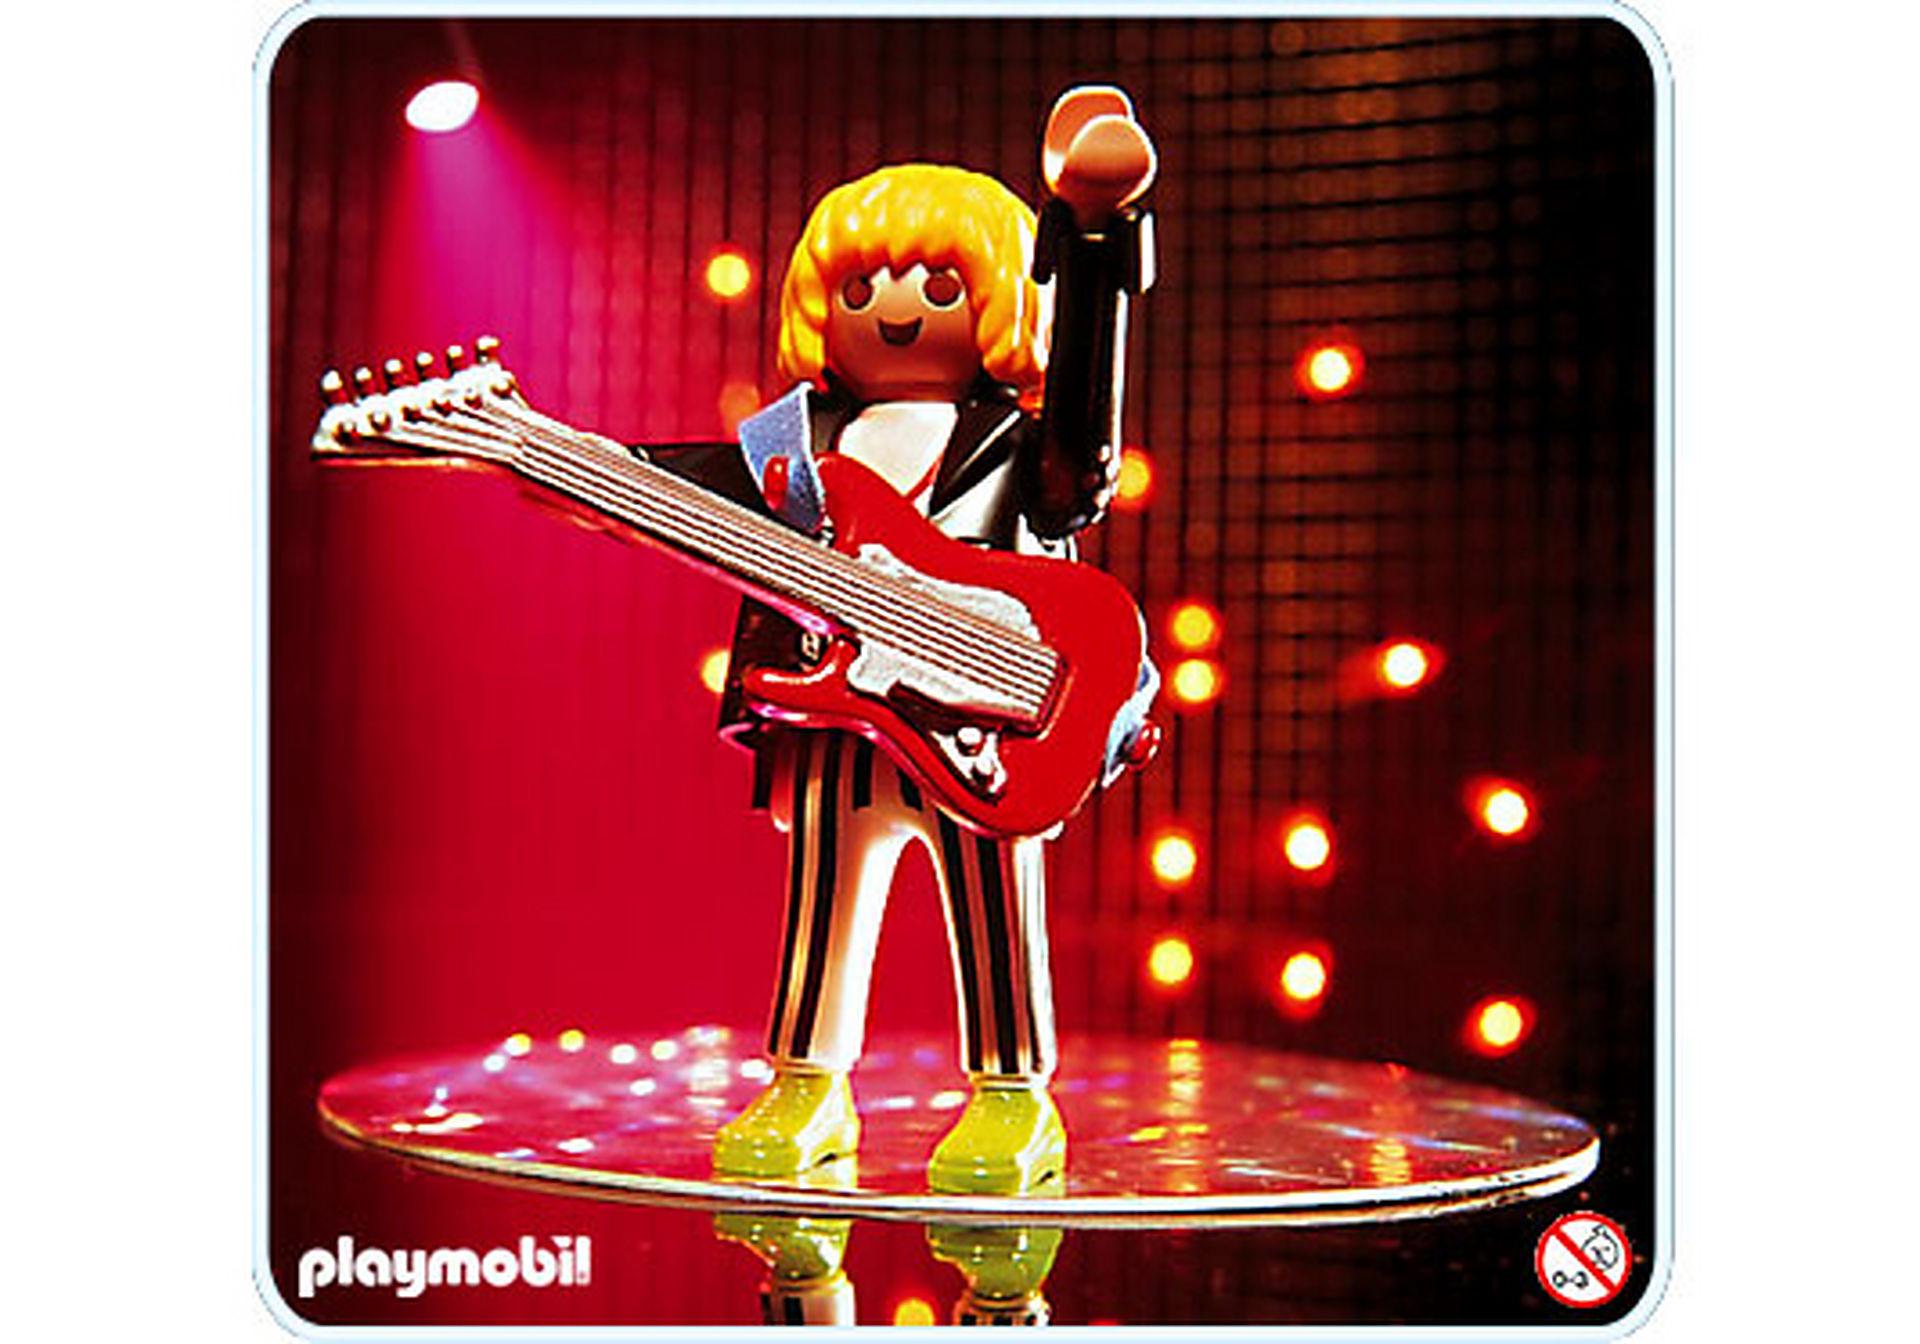 4512-A Guitariste de rock zoom image1